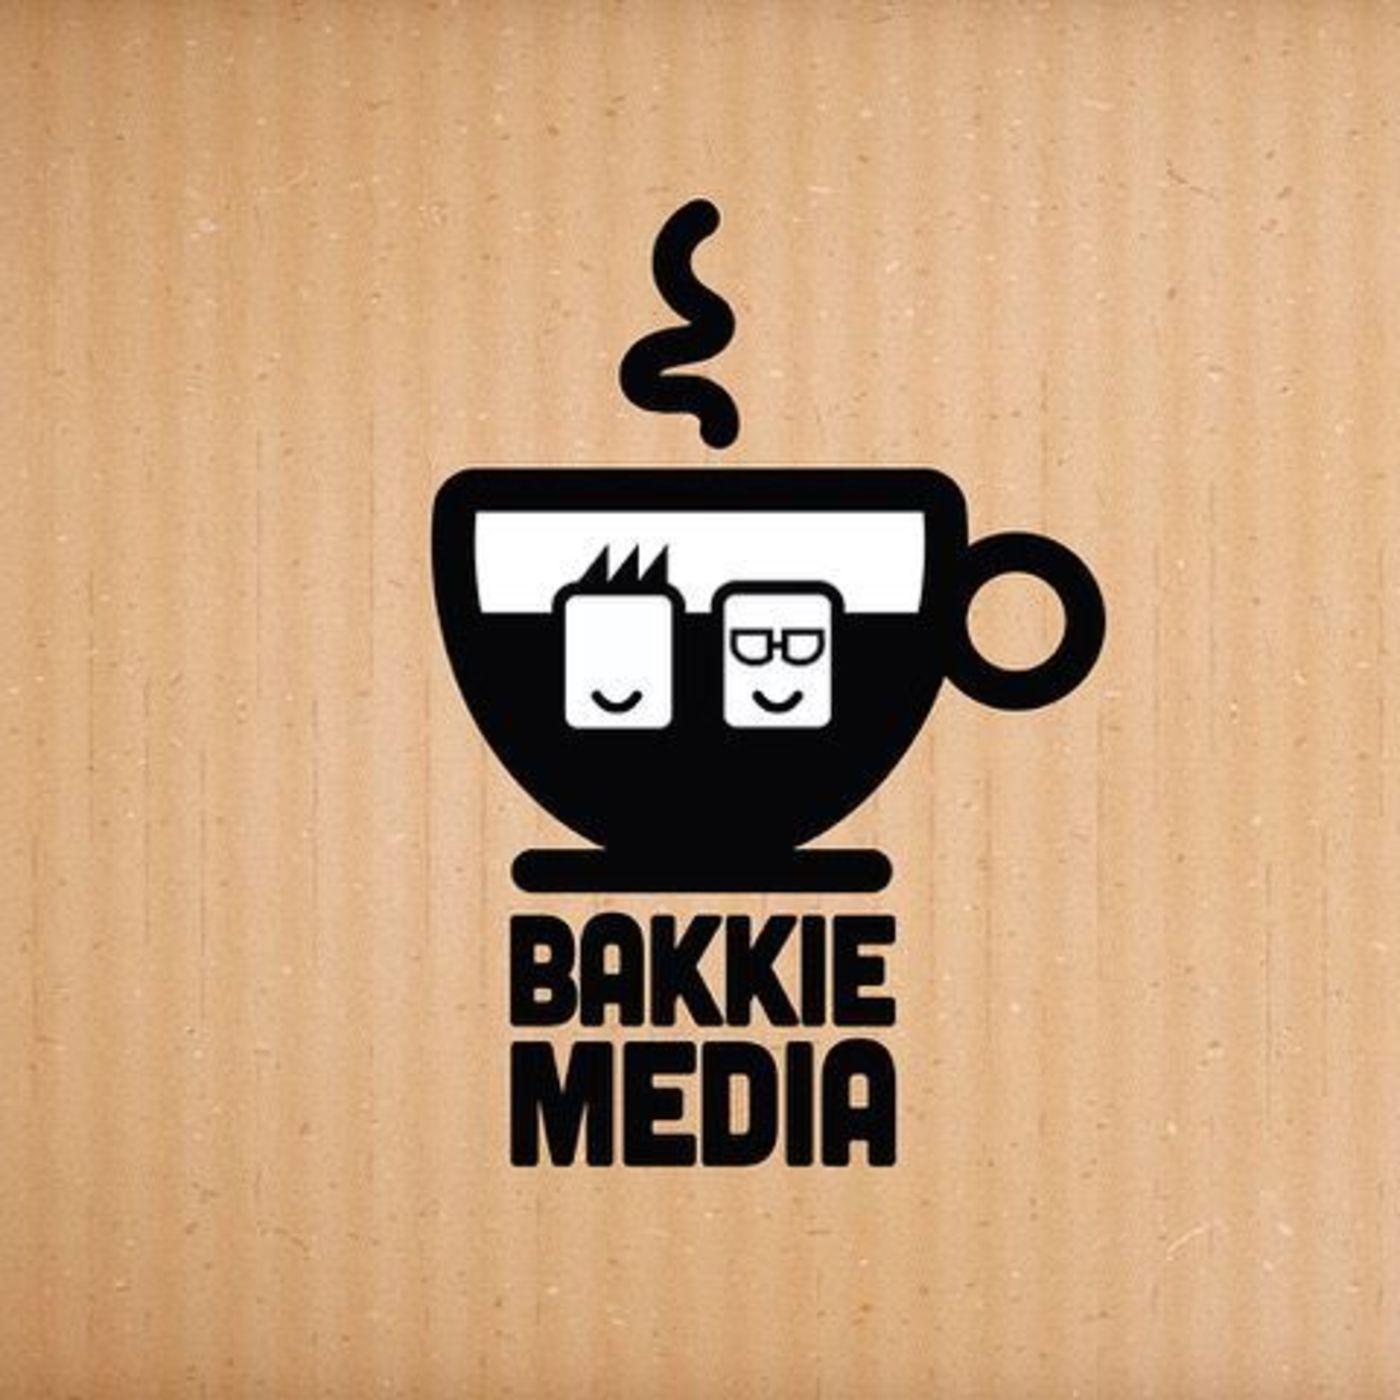 Bakkie Media logo